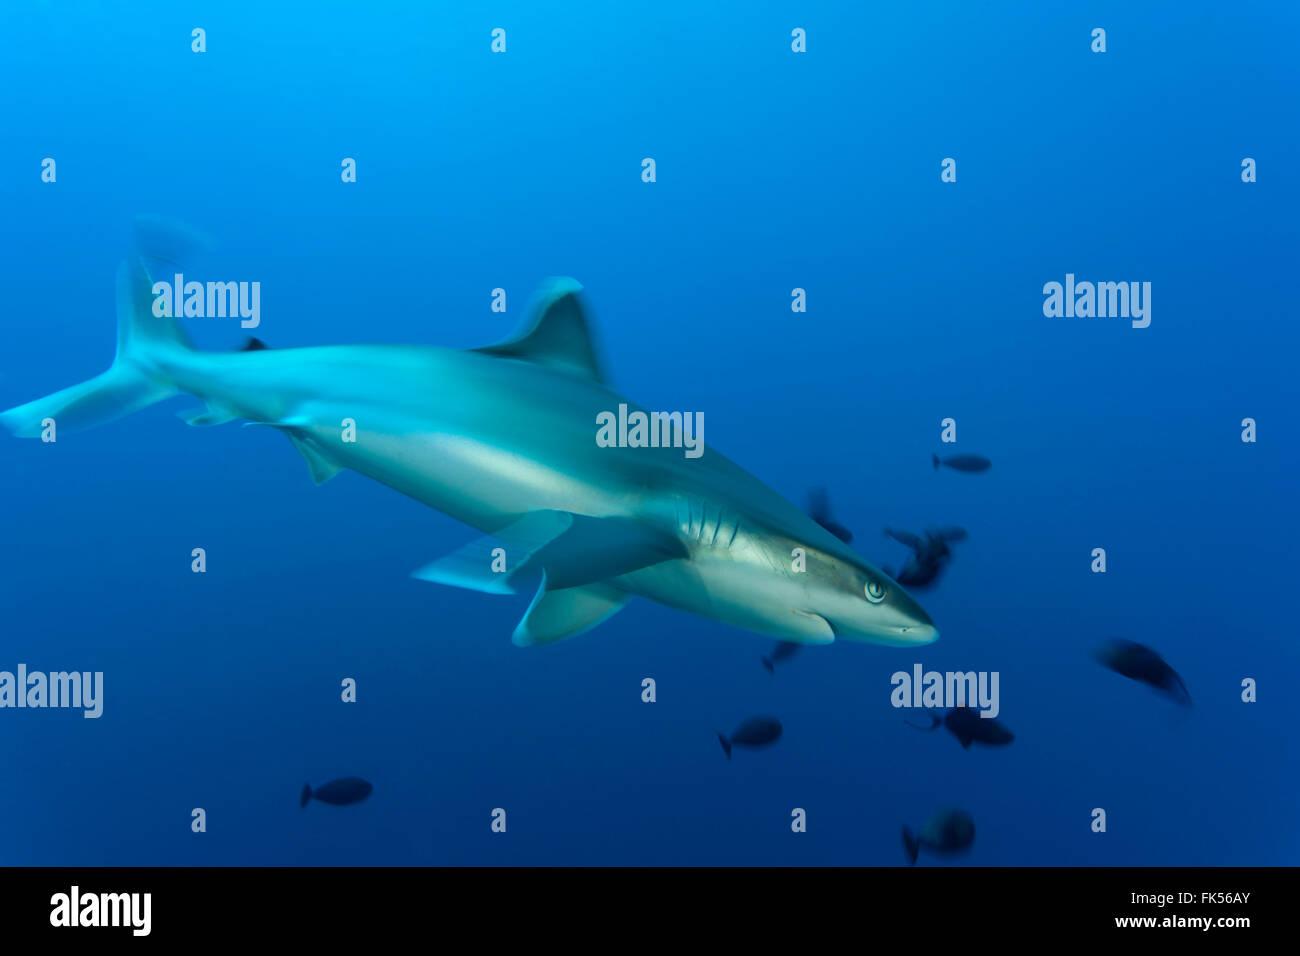 Silvertip reef shark (Carcharhinus albimarginatus) - Stock Image